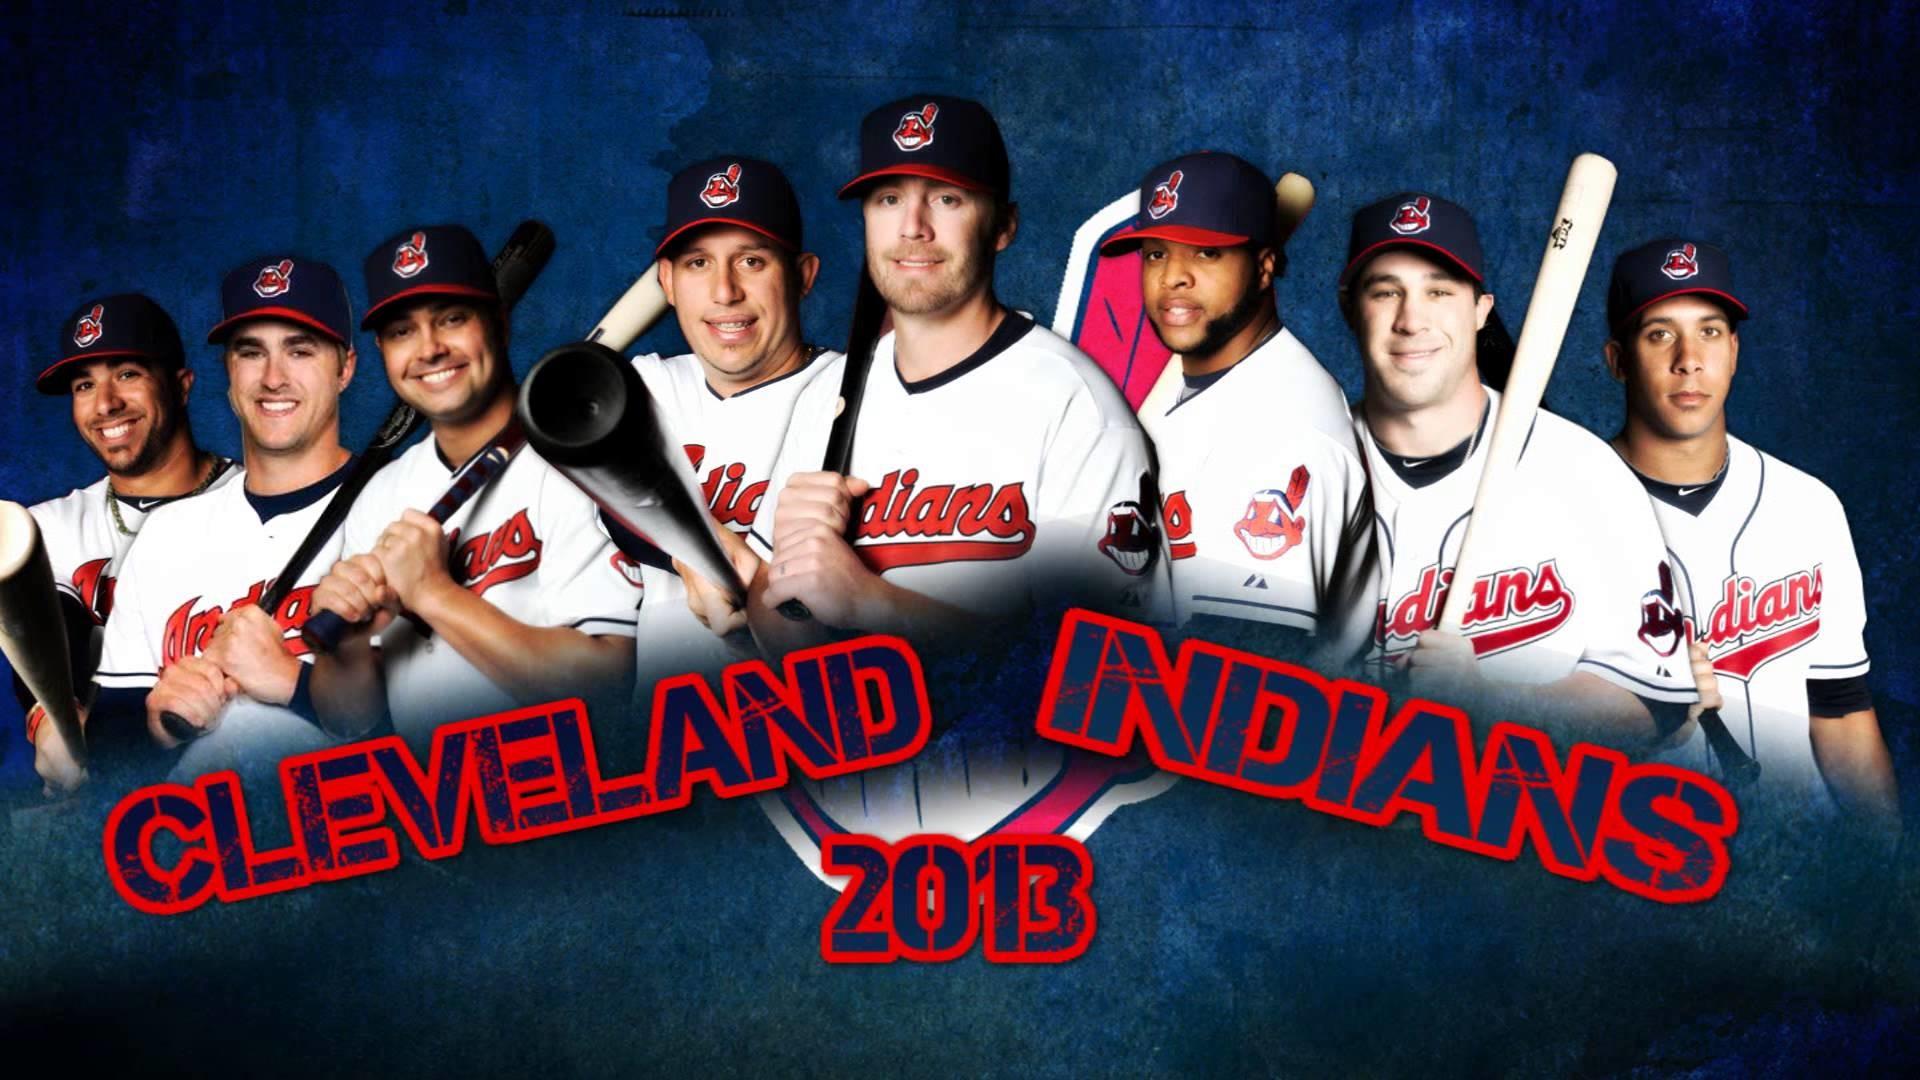 Cleveland Indians 2013 Custom Poster – YouTube